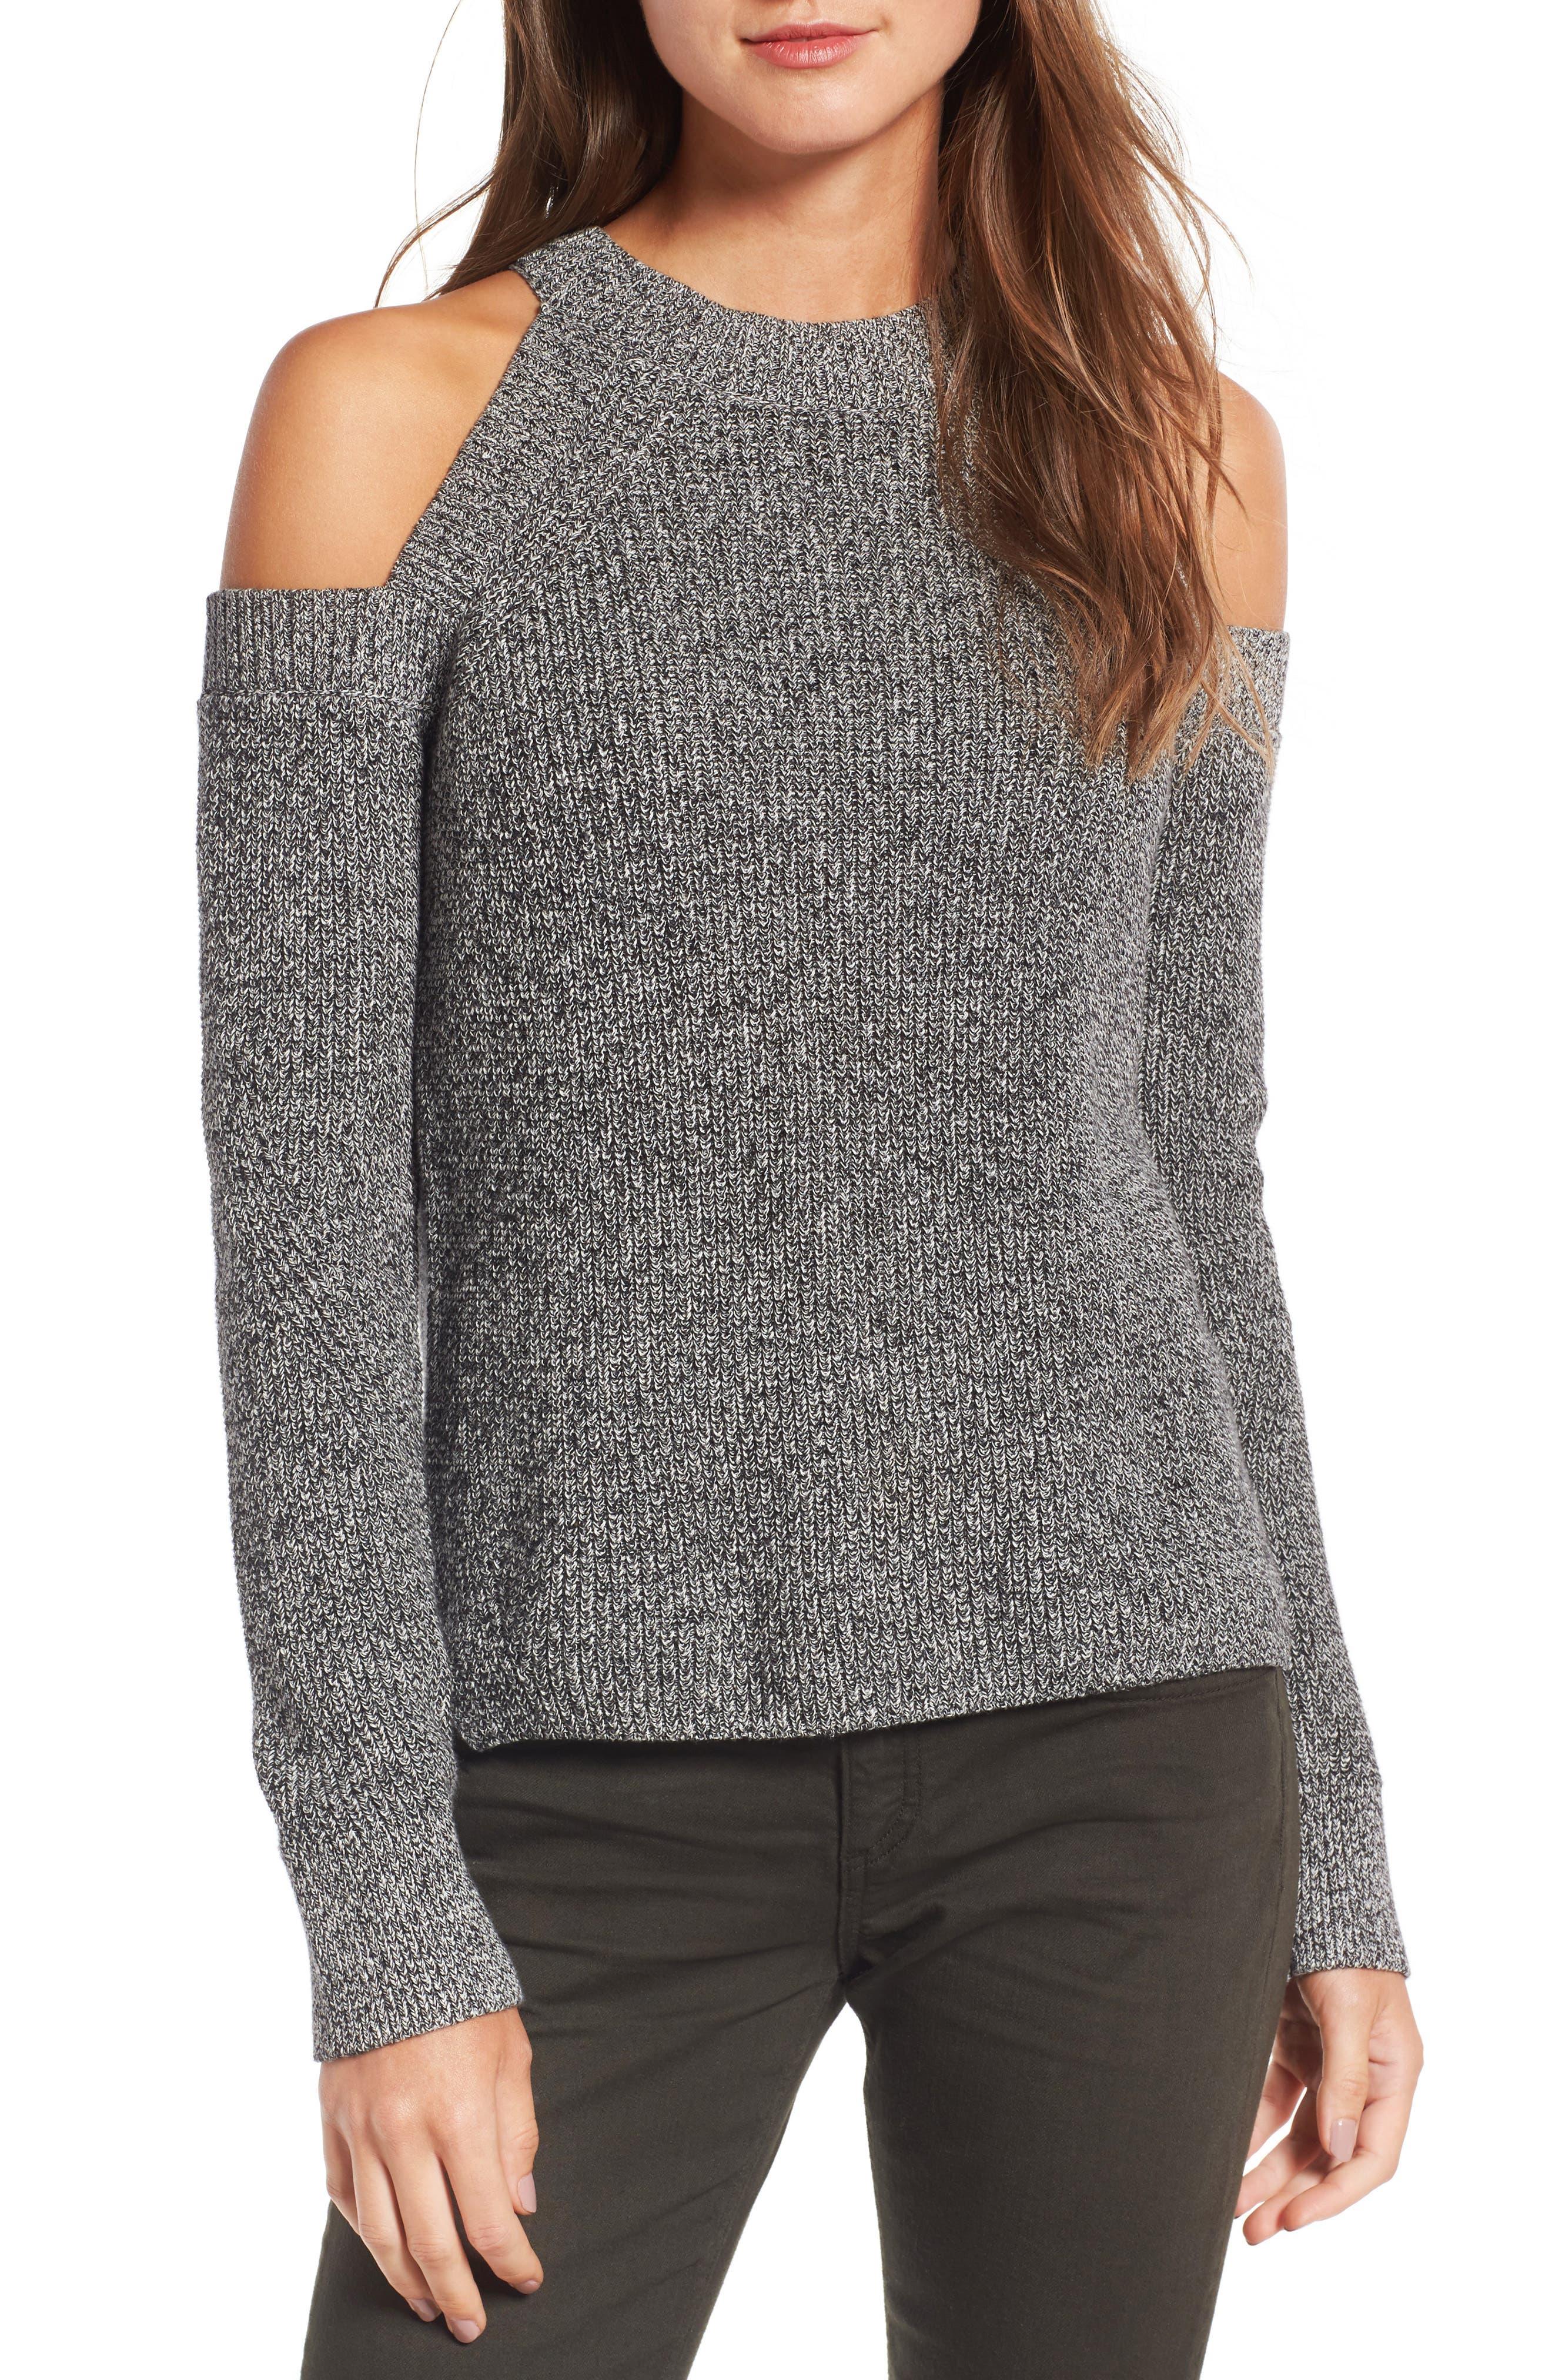 Alternate Image 1 Selected - rag & bone/JEAN Dana Cold Shoulder Sweater